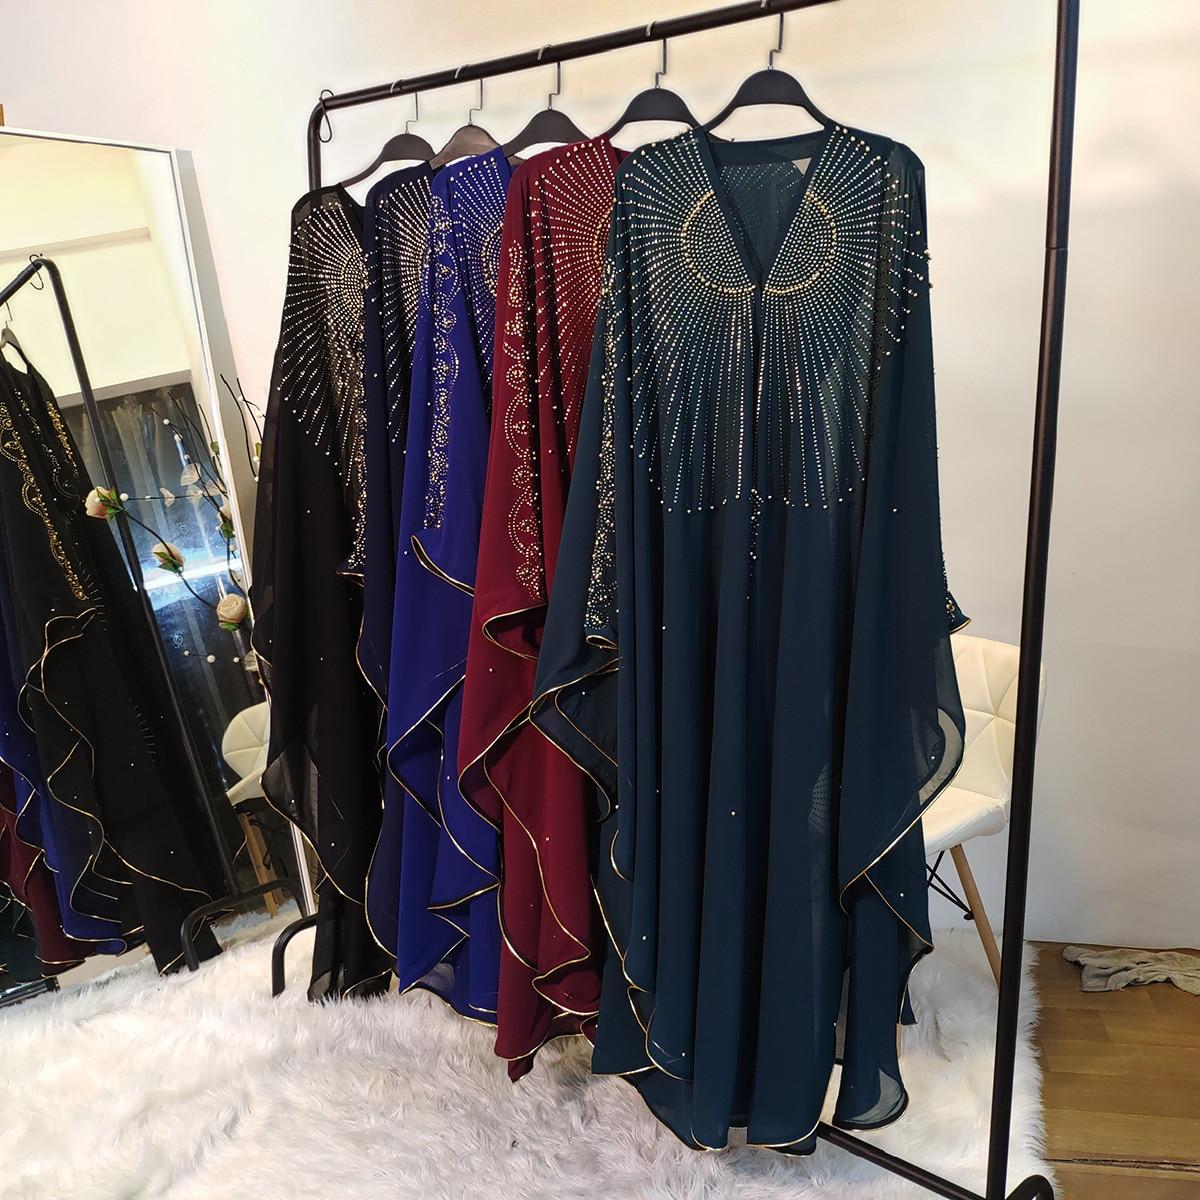 Ropa de oración musulmana Ramadán para mujeres Iftar Abayas manga de murciélago con cuentas con capucha Dubai Turquía oración larga ropa islámica hiyab vestido